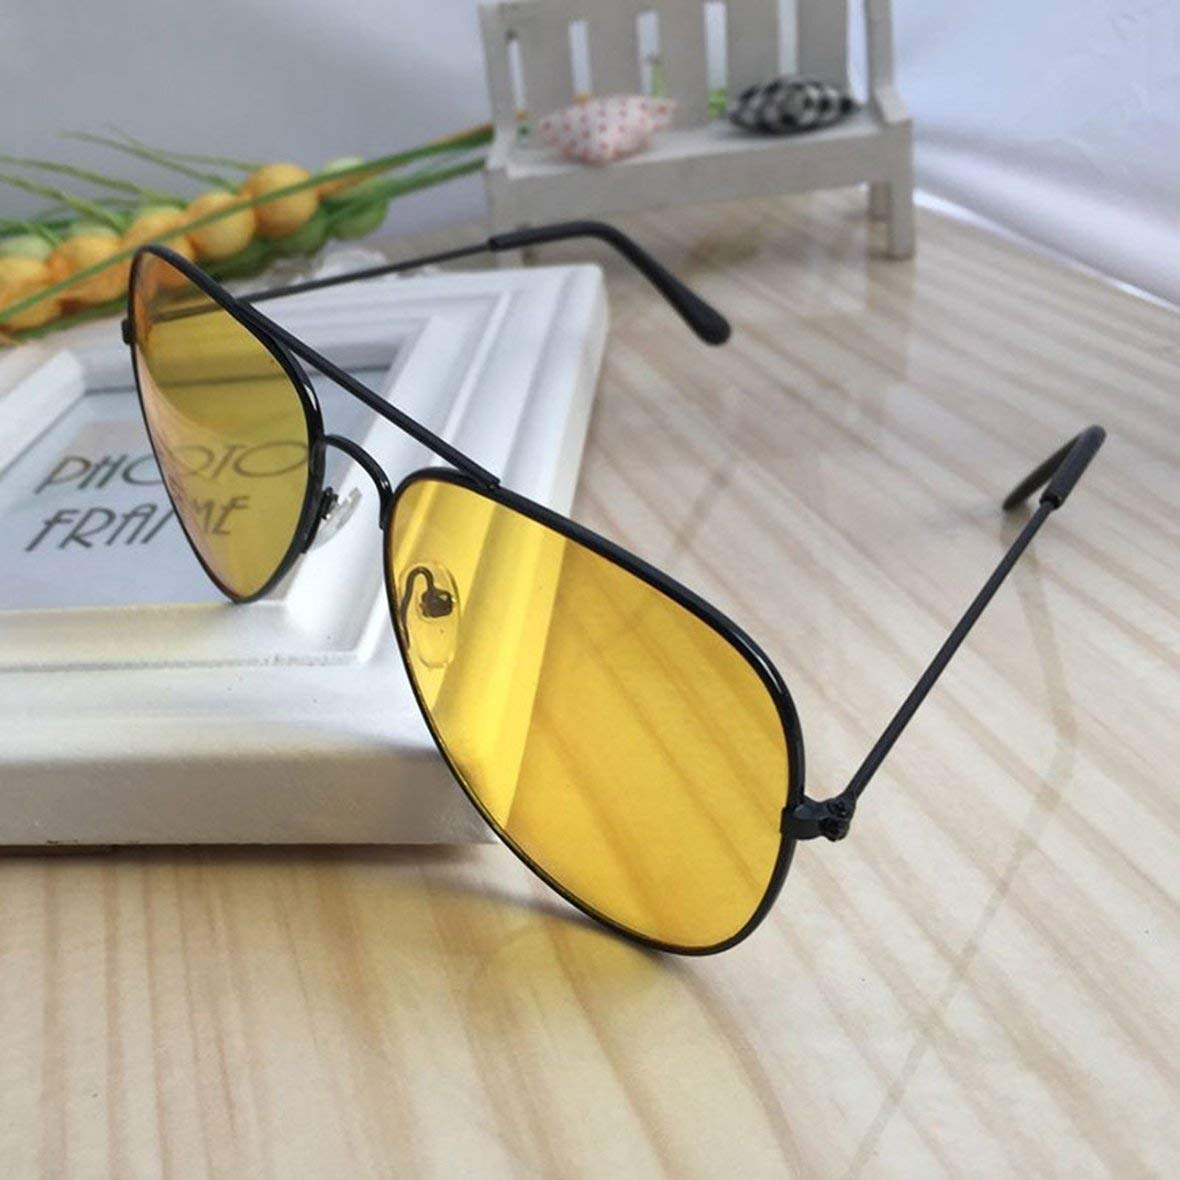 Gafas de sol de visi/ón nocturna de Heaviesk Gafas antirreflejos UV Sight Night Sight HD Gafas de protecci/ón antirreflejos UV400